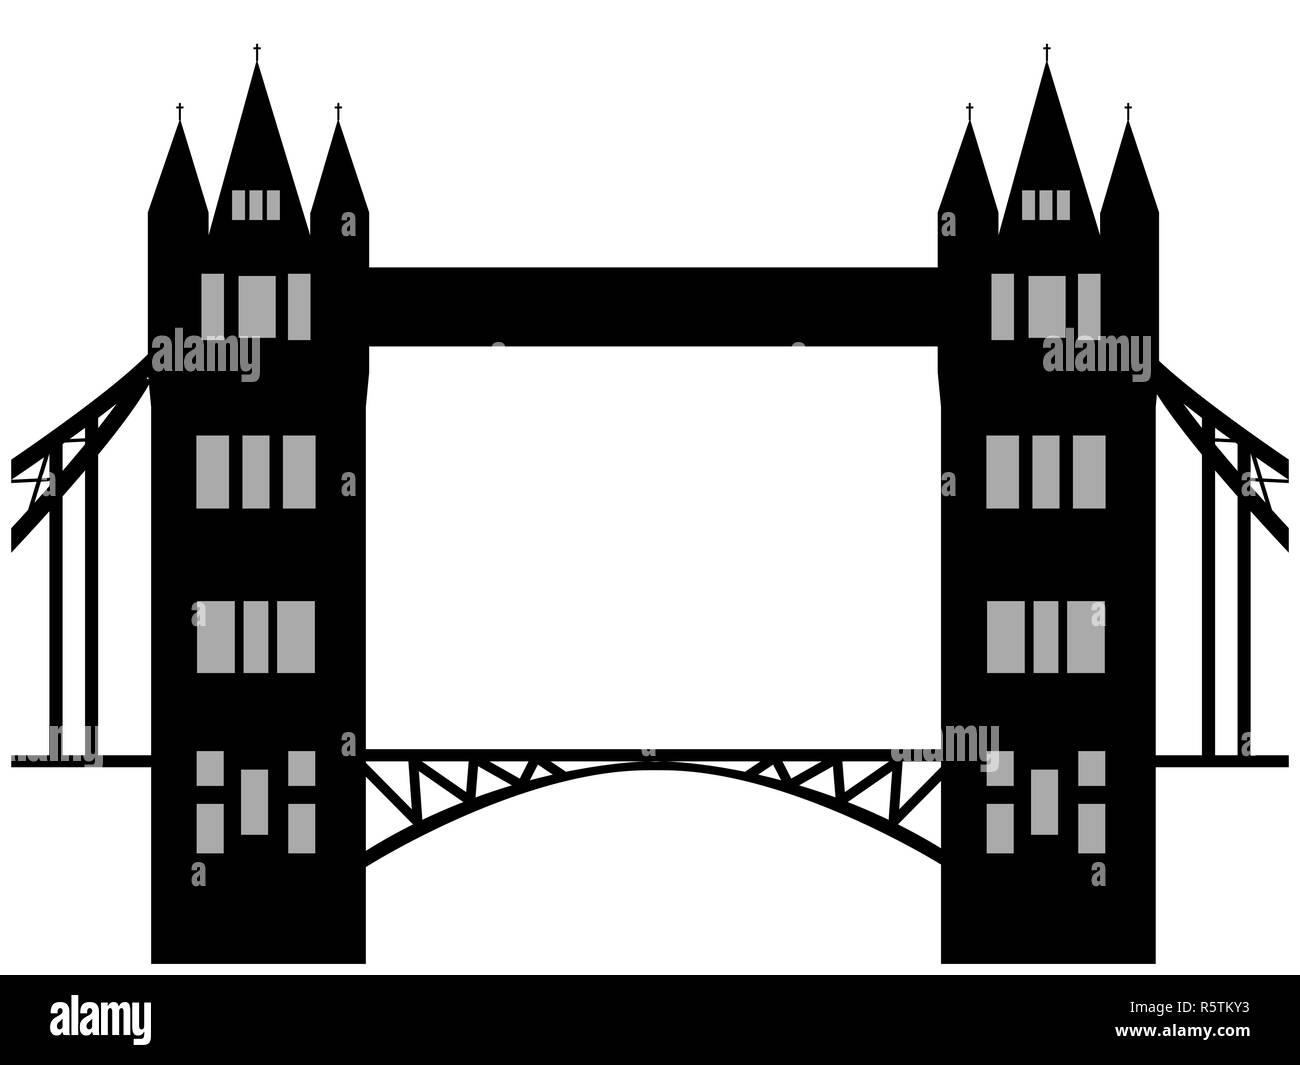 Image of cartoon Tower bridge silhouette. Vector illustration isolated on white background. - Stock Image